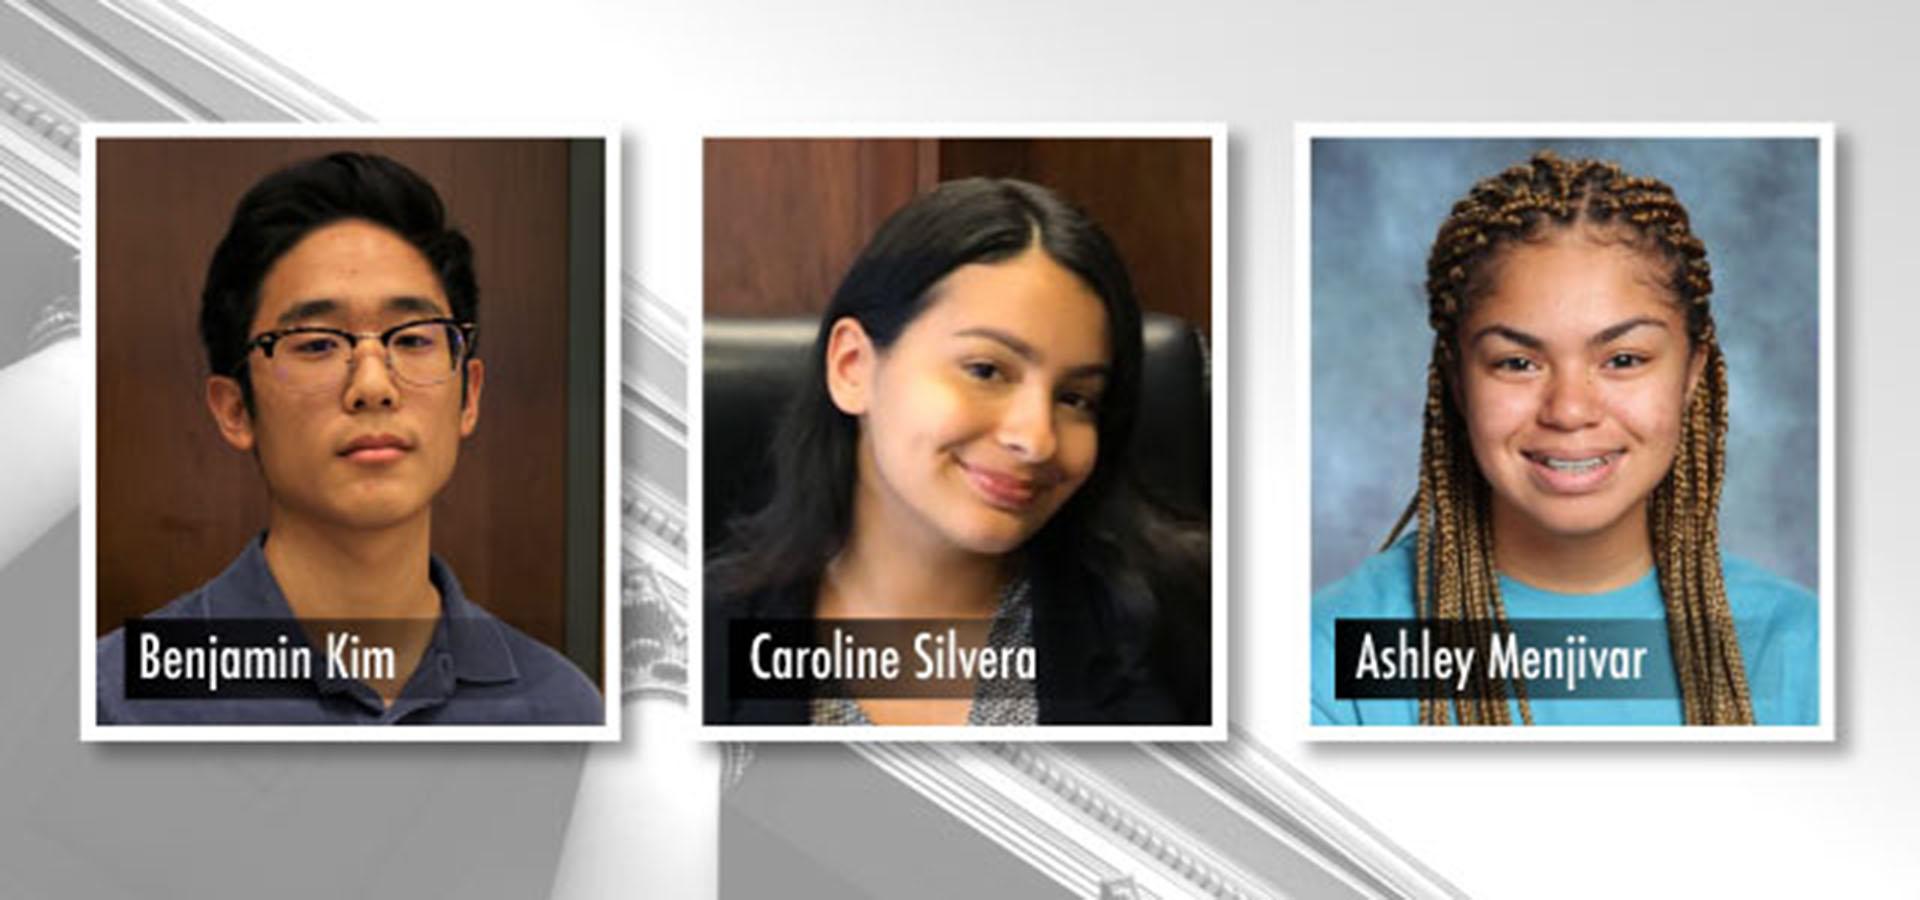 Student representatives for School Board chosen